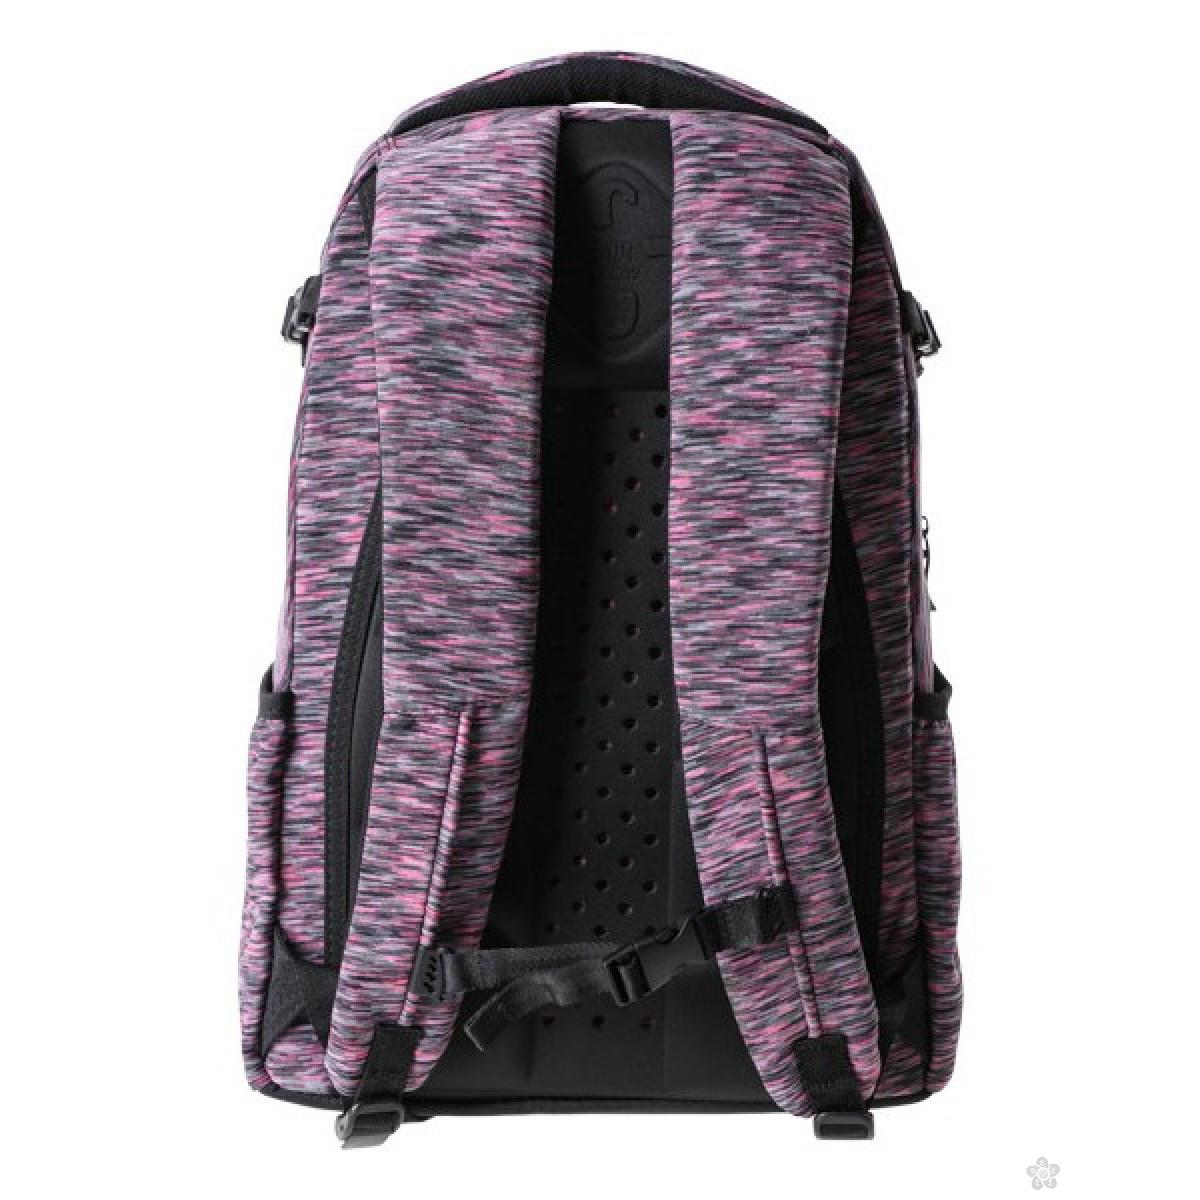 Ergonomski ranac Authentic-pink 161521